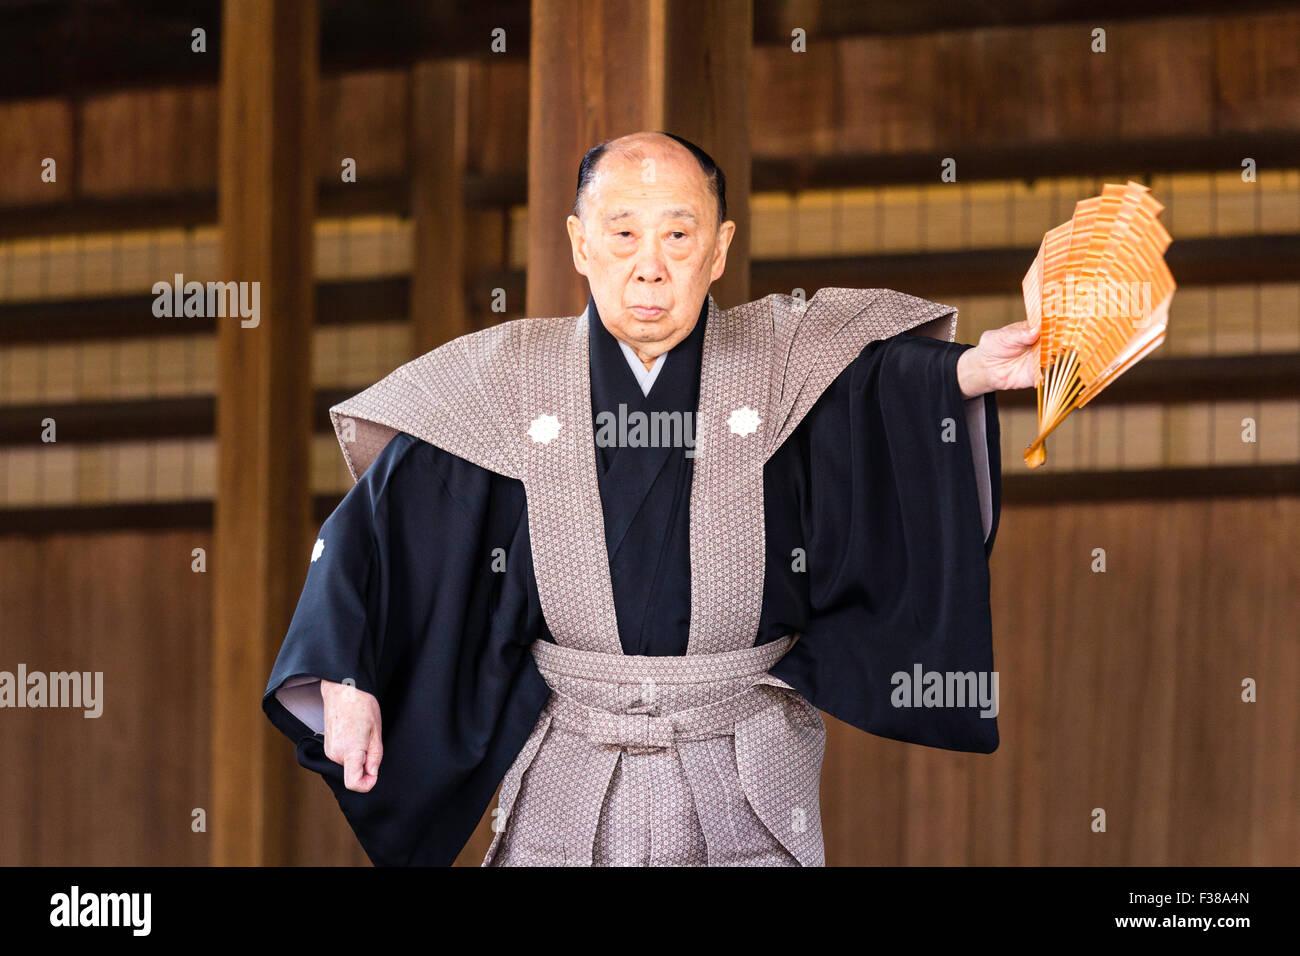 Yasaka Shrine, Japanese famous Noh actor, Katayama Yusetsu, performing Kyogen comedy dance, with fan, on Noh stage - Stock Image